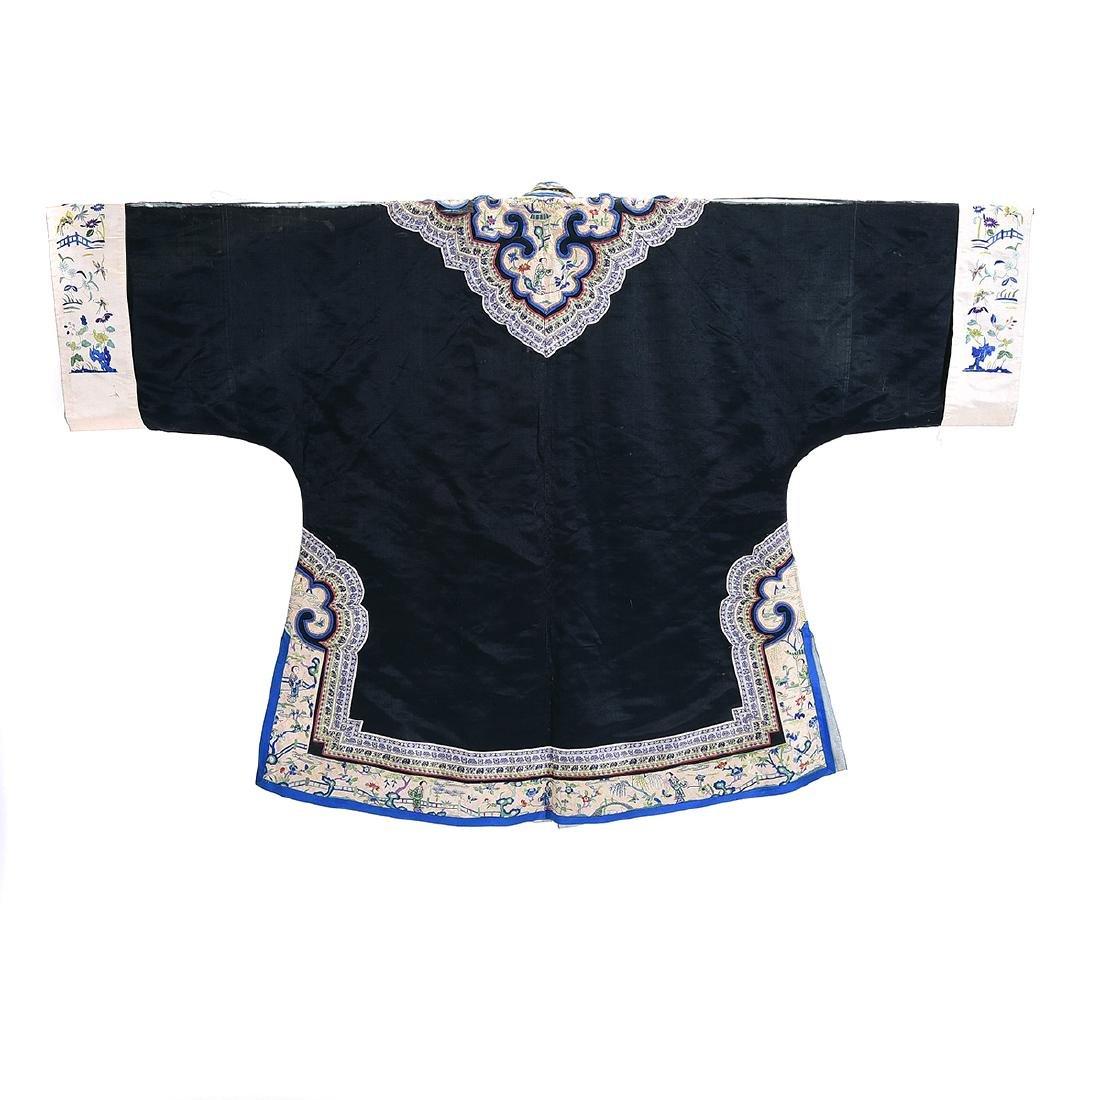 Embroidered Silk Black Ground Lady's Robe - 5